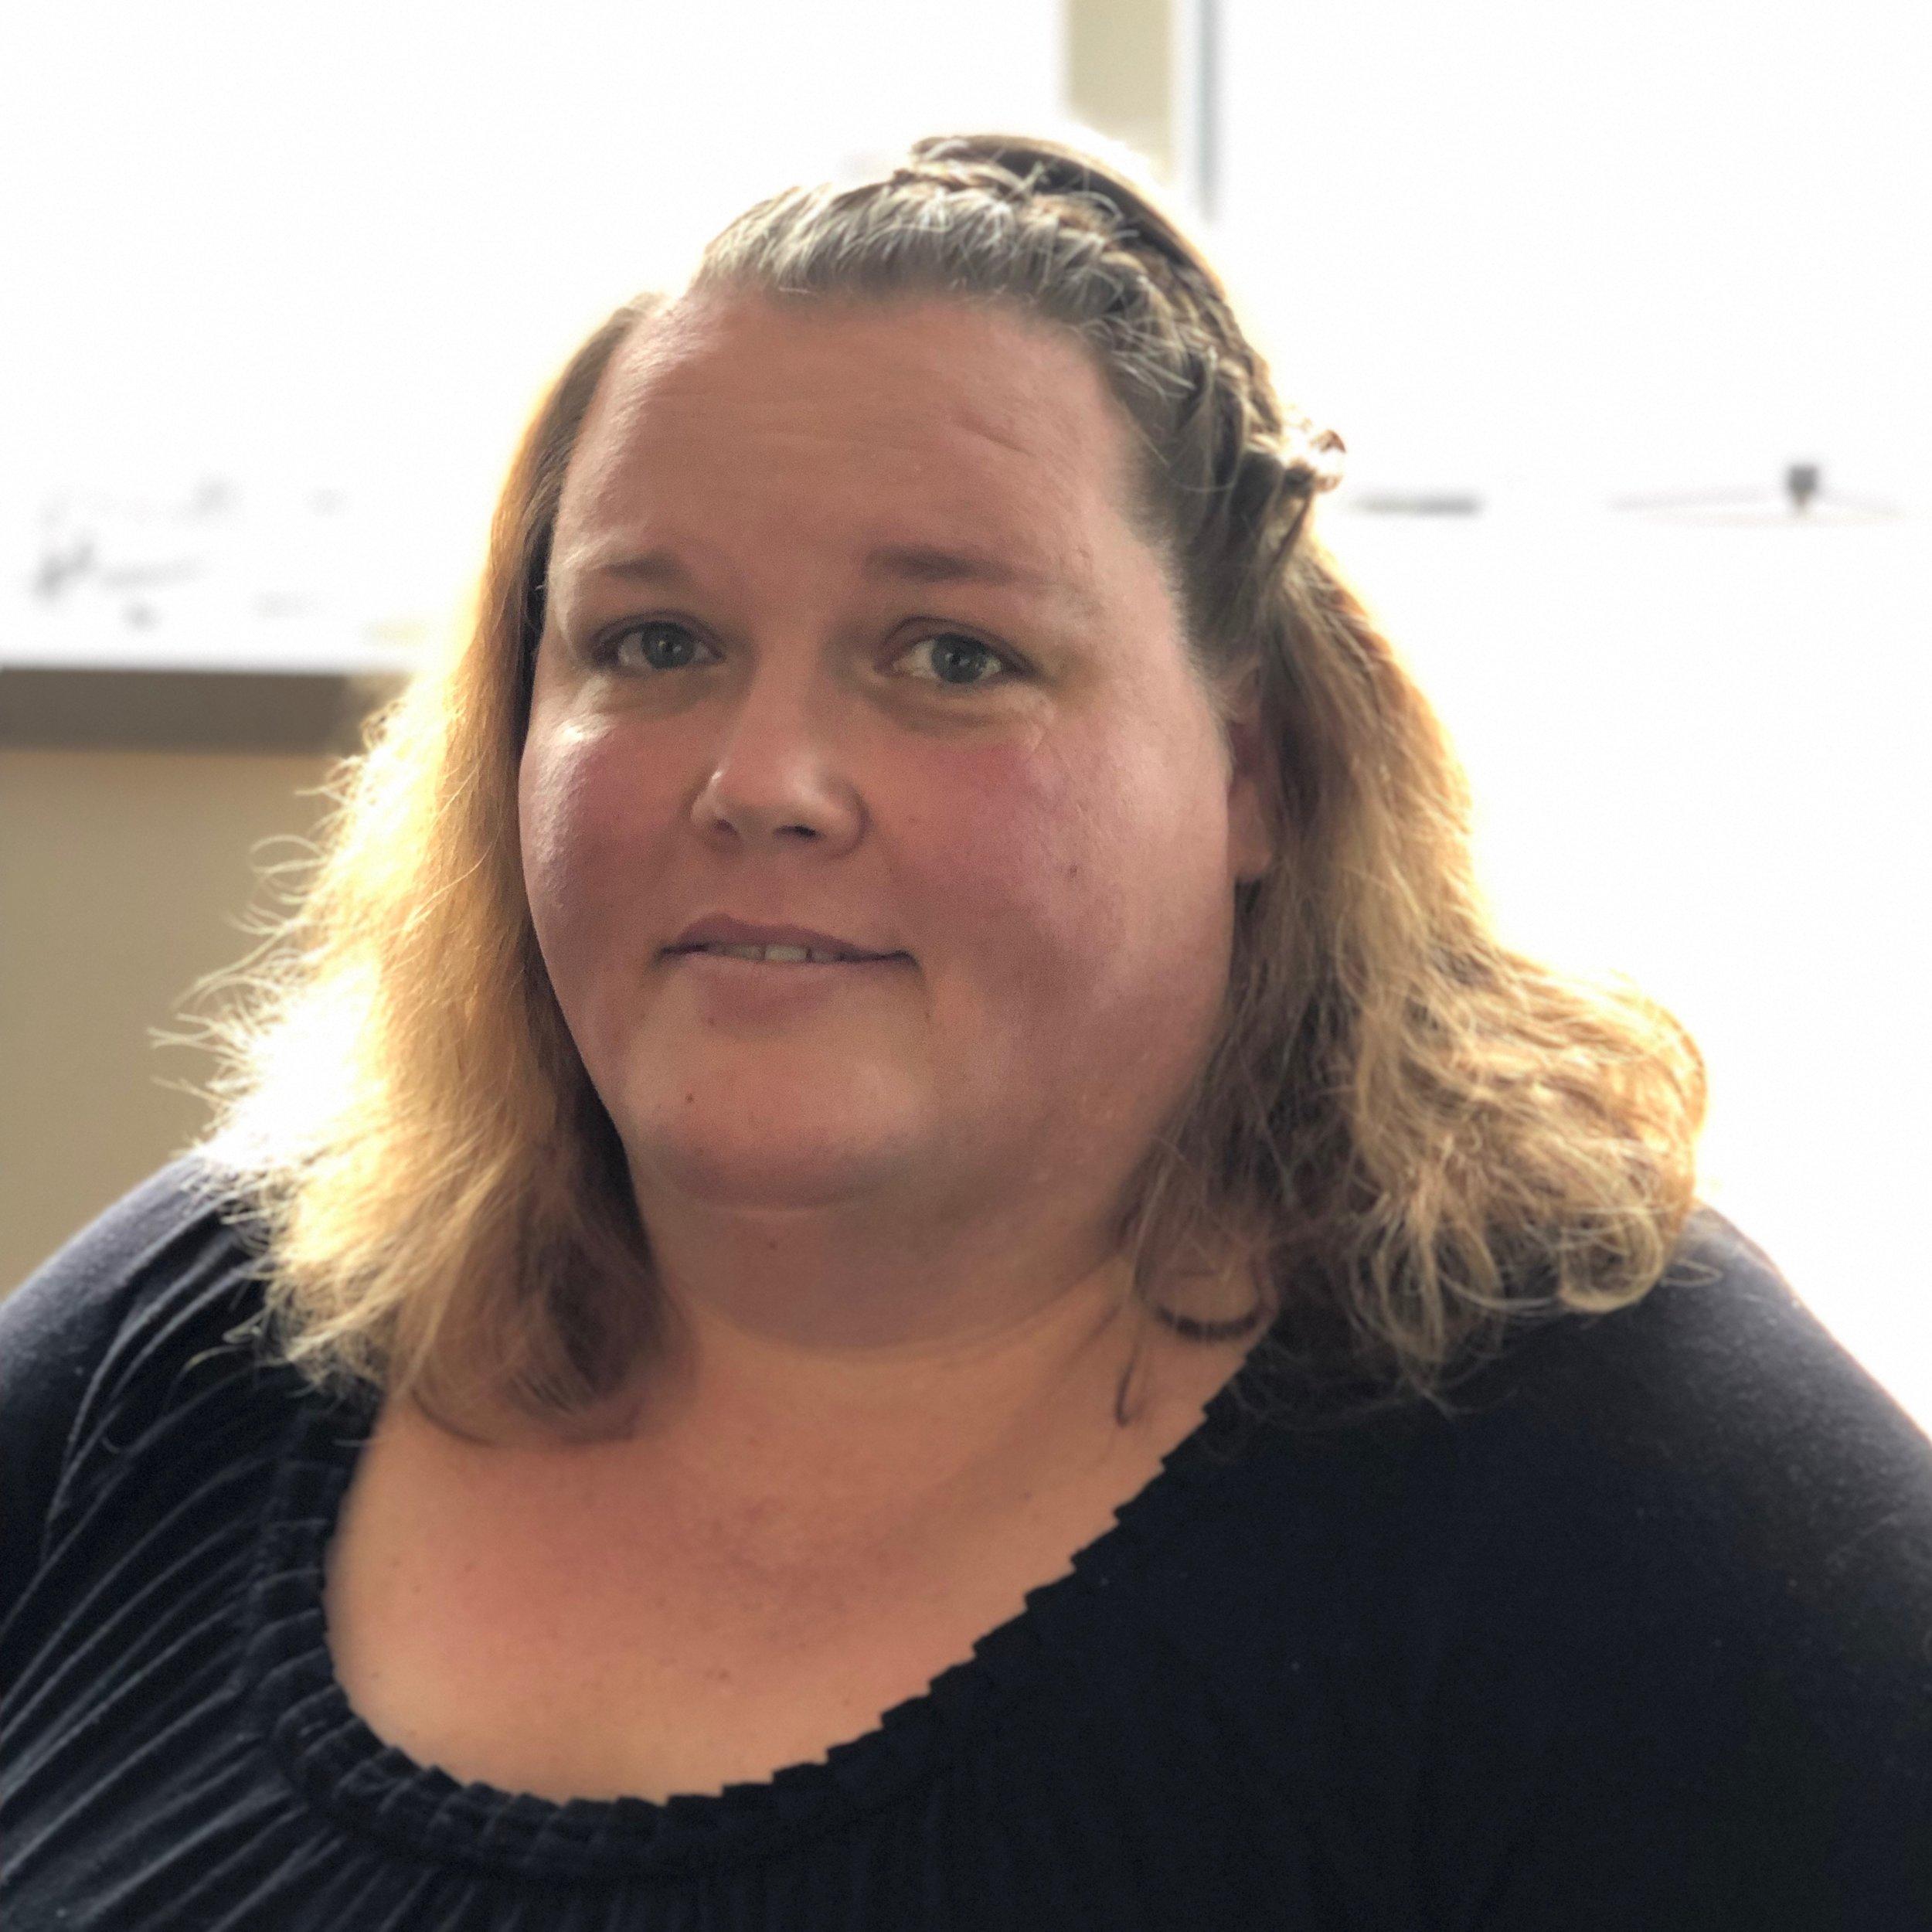 Melissa Gregg